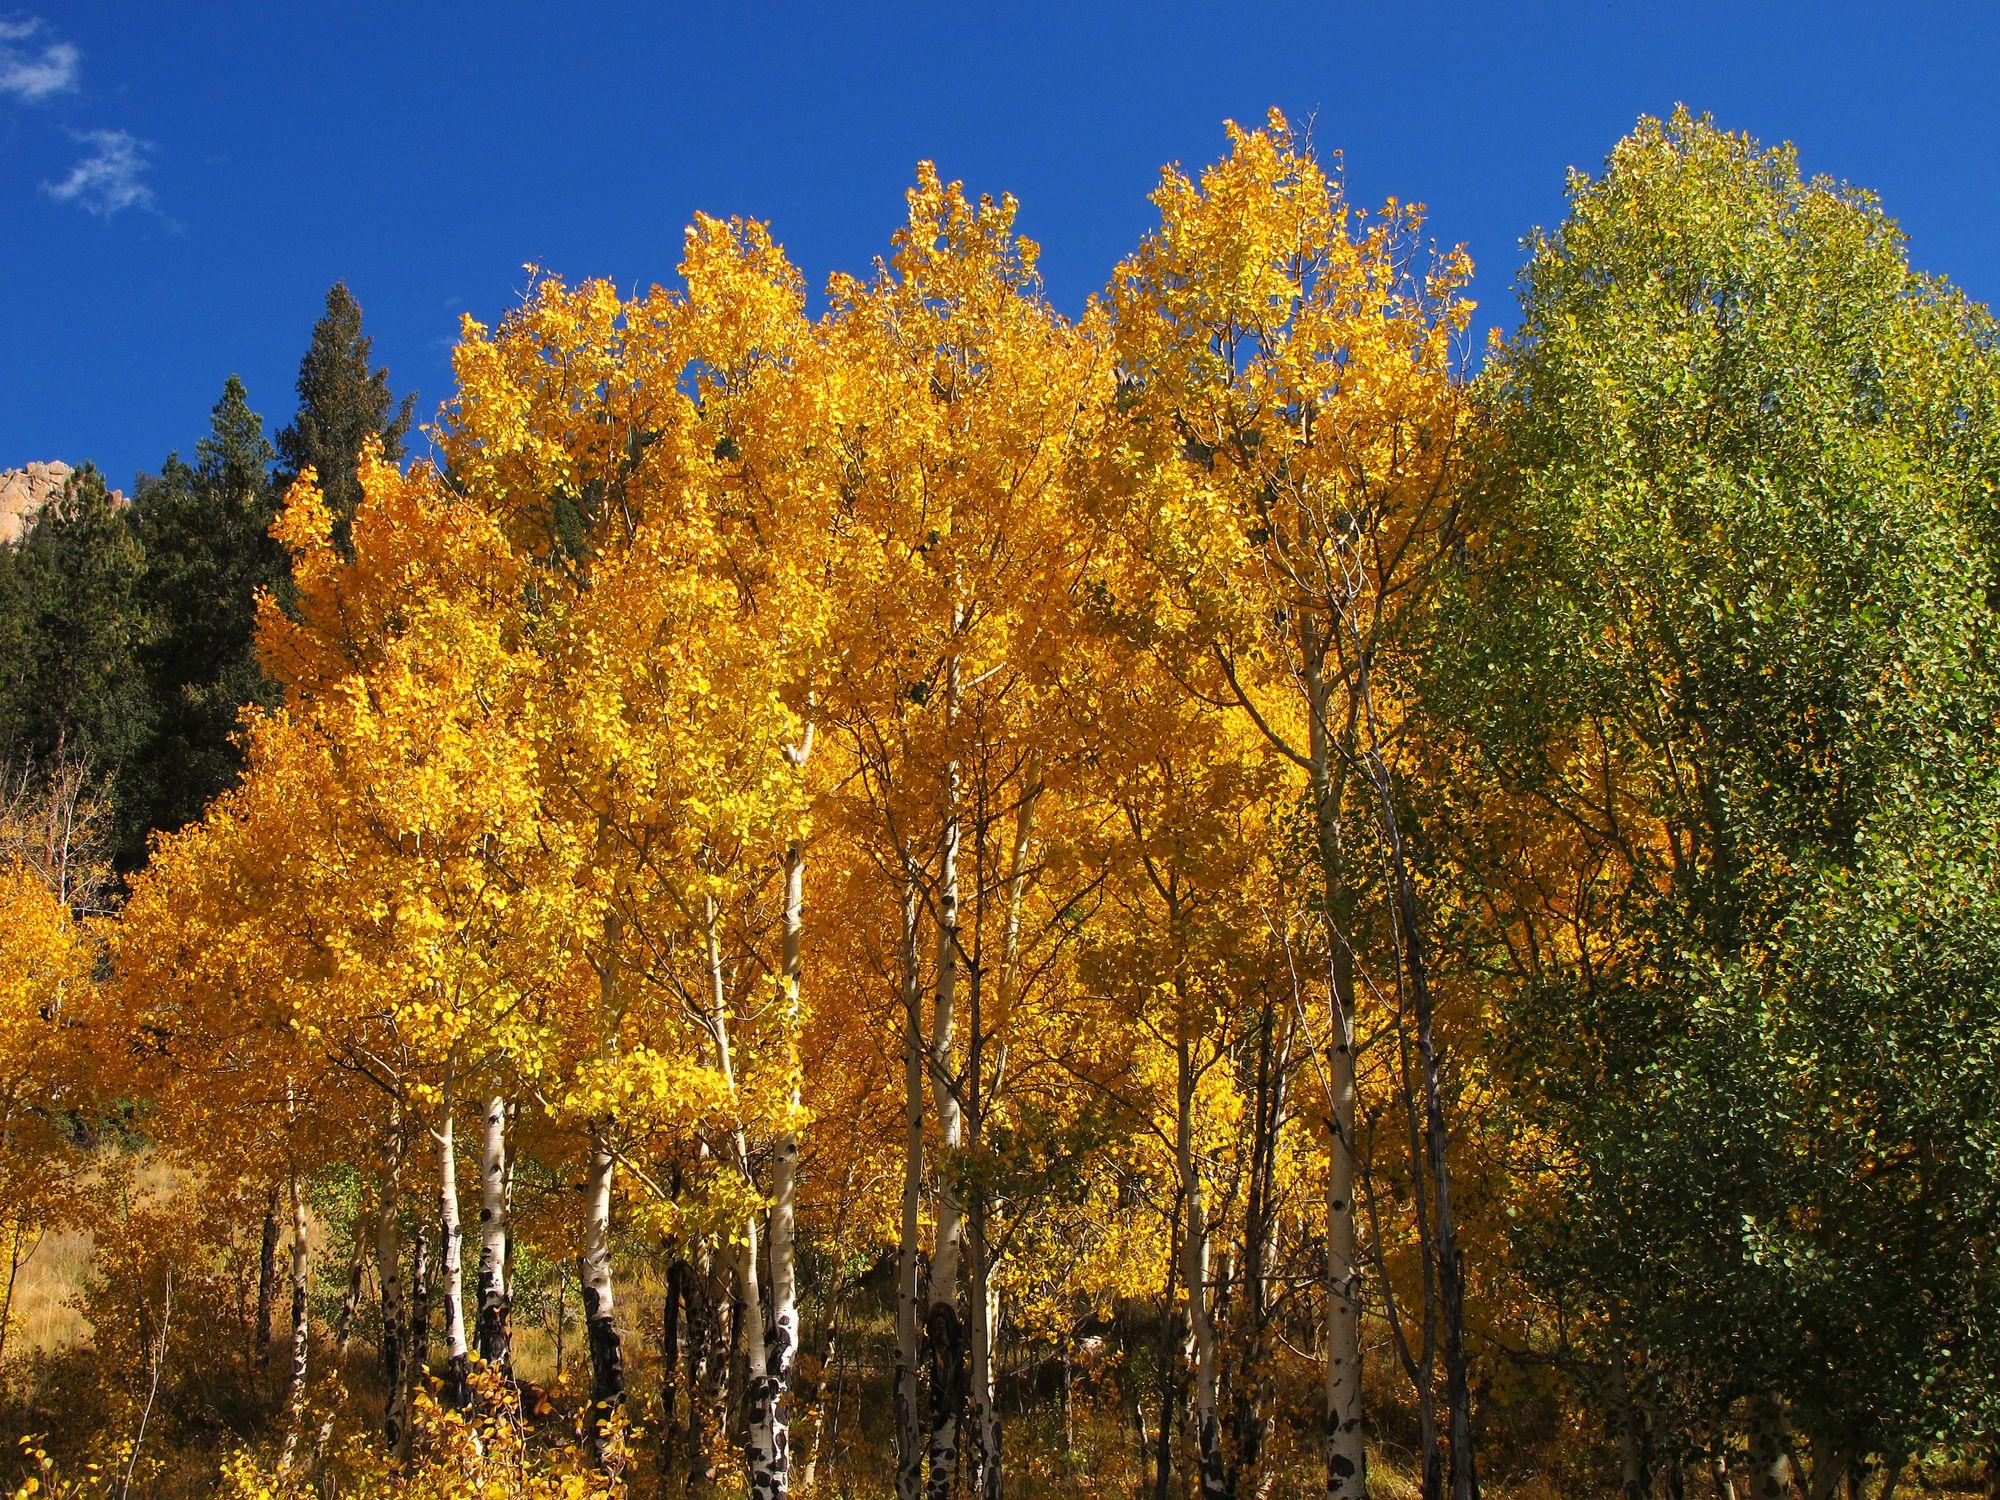 Golden autumn colors in Golden Gate Canyon State Park (Rocky Mountains, Colorado).